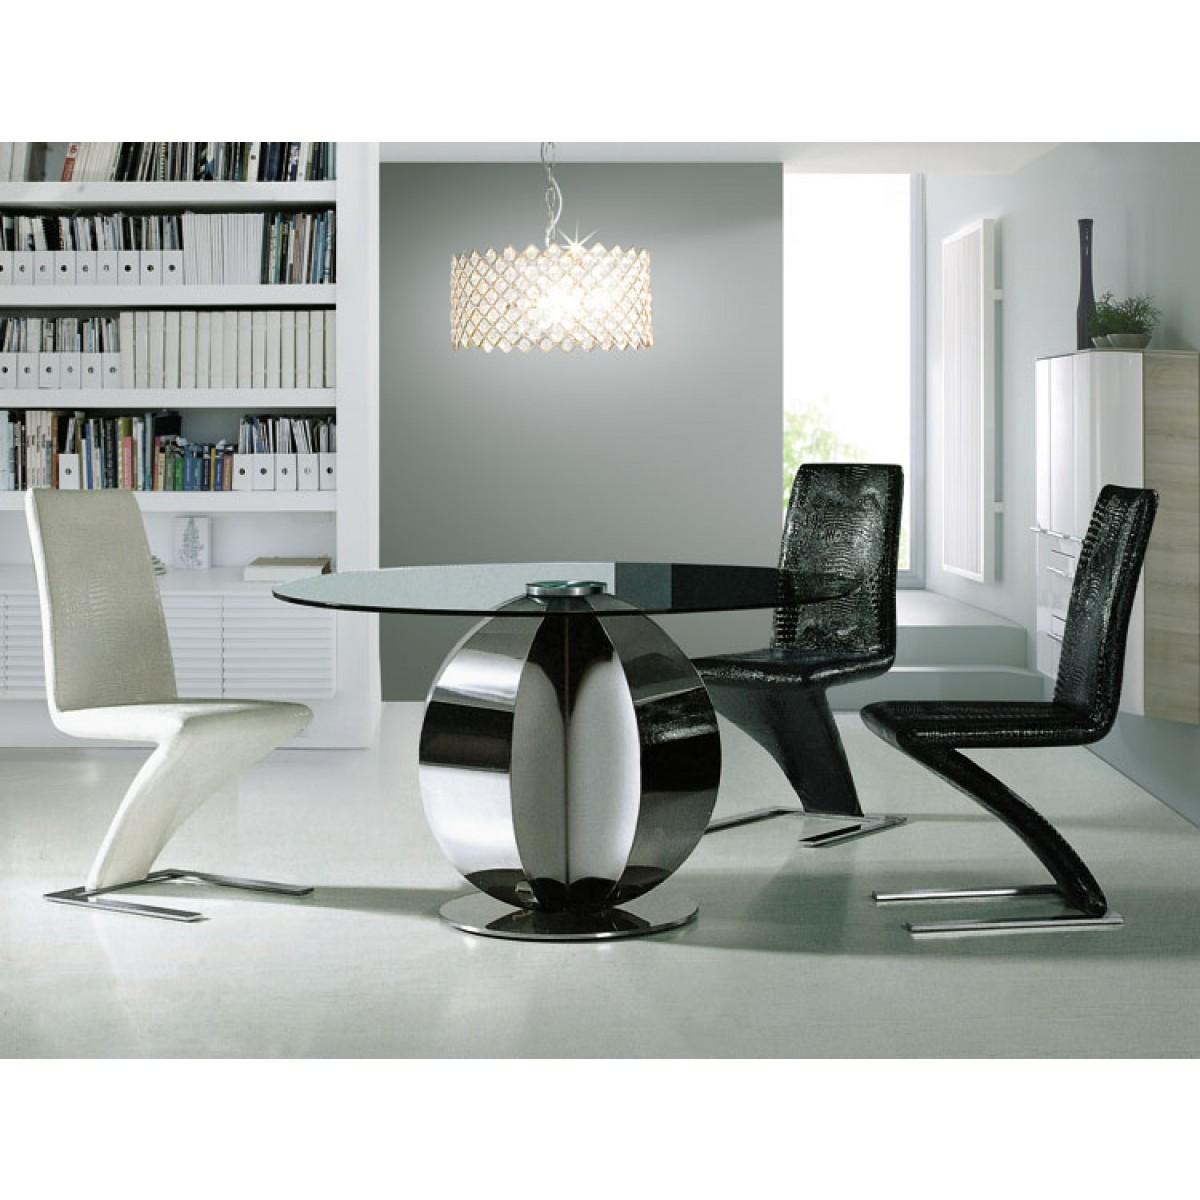 Superbe Table Design Giro Pop Designfr